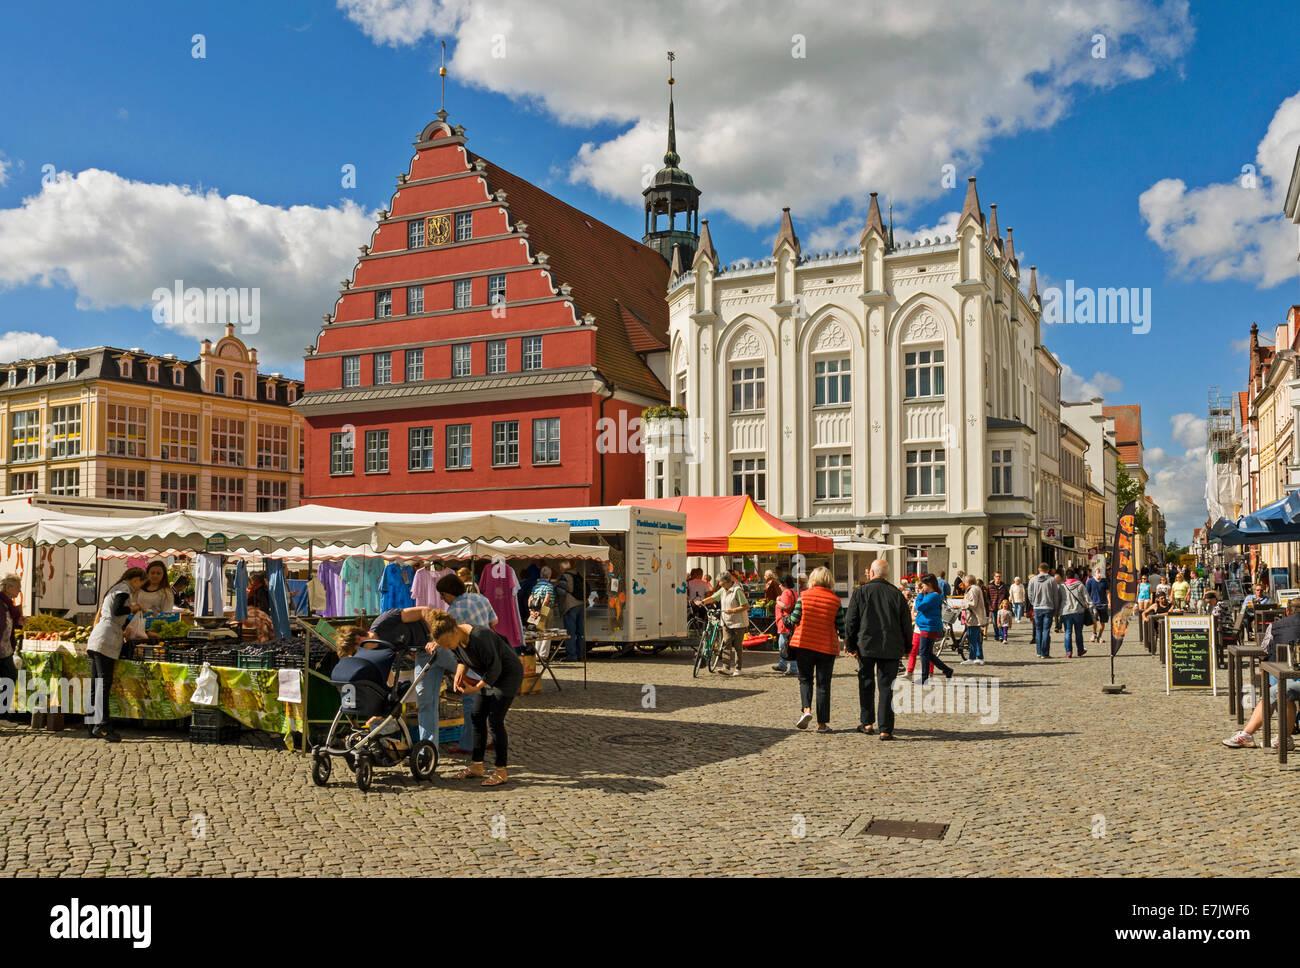 Market Square & Town Hall, Greifswald, Mecklenburg-Western Pomerania, Germany. - Stock Image